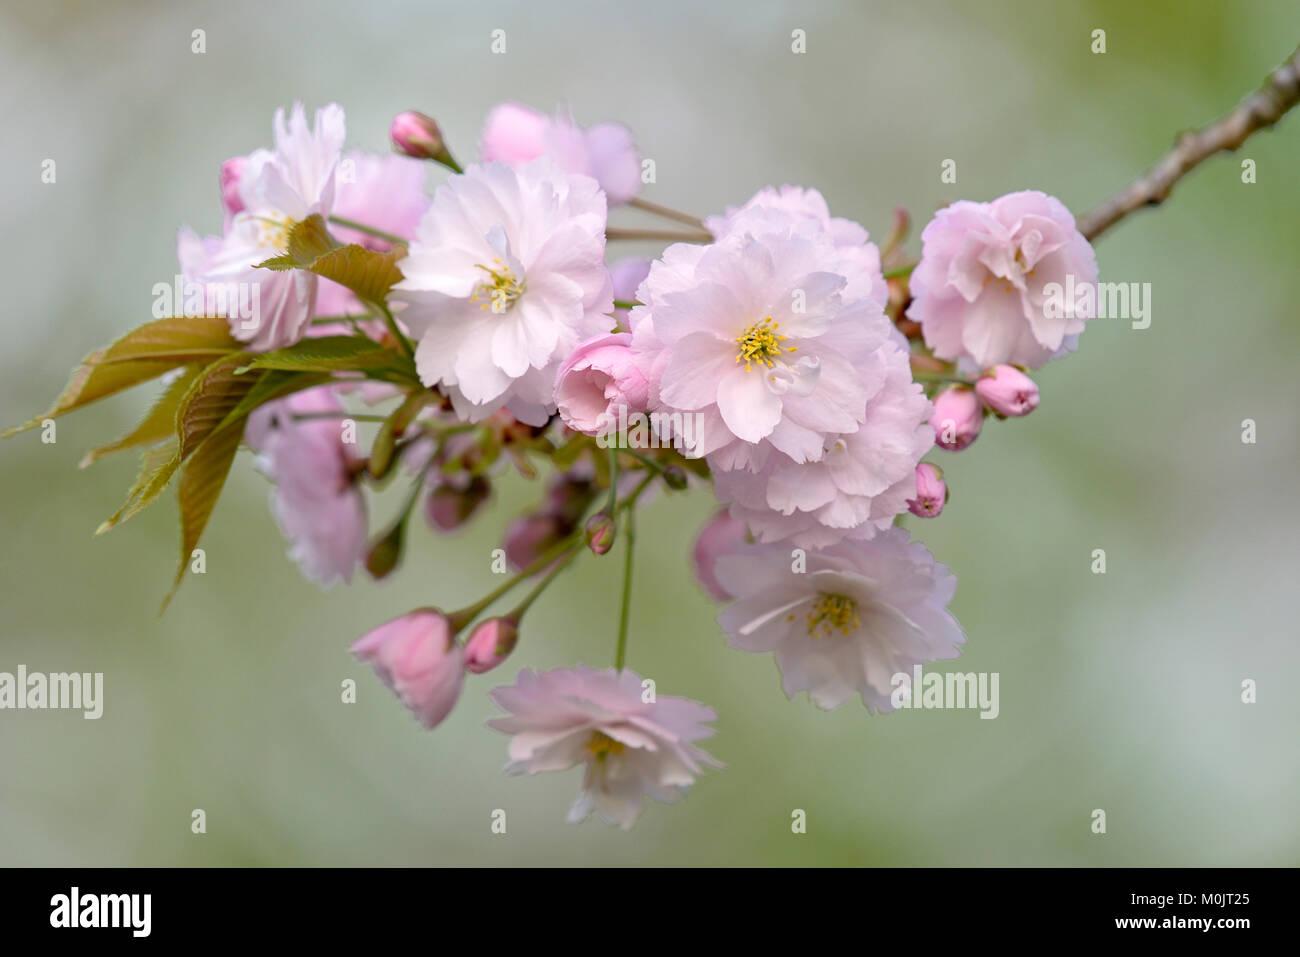 Cherry blossom, cherry tree (Prunus sp.), twig with flowers, North Rhine-Westphalia, Germany - Stock Image